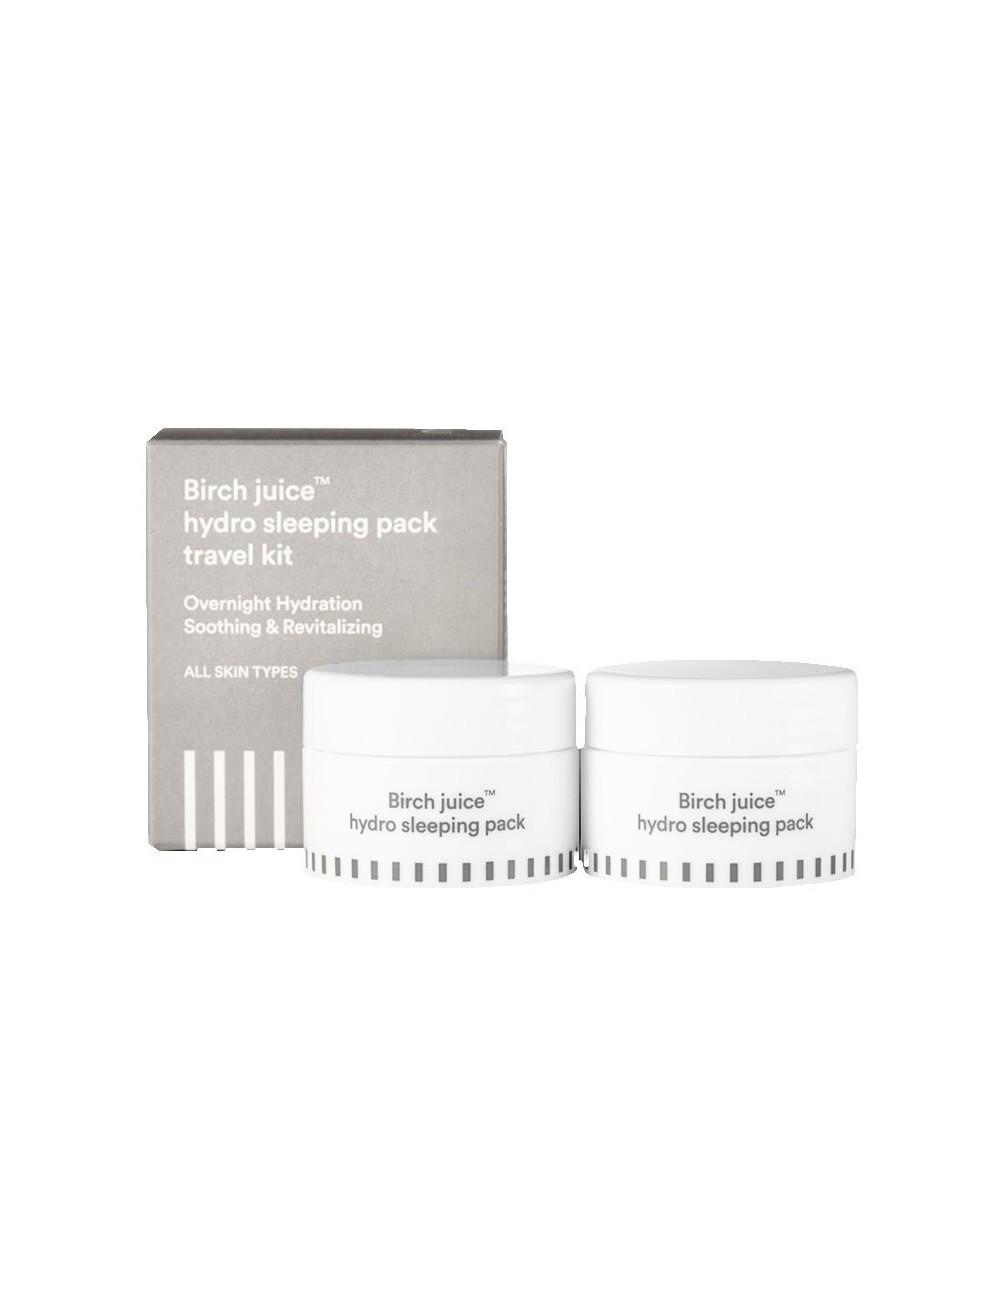 Mascarilla Nocturna E NATURE Birch Juice Hydro Sleeping Pack Travel Kit (2 piezas)